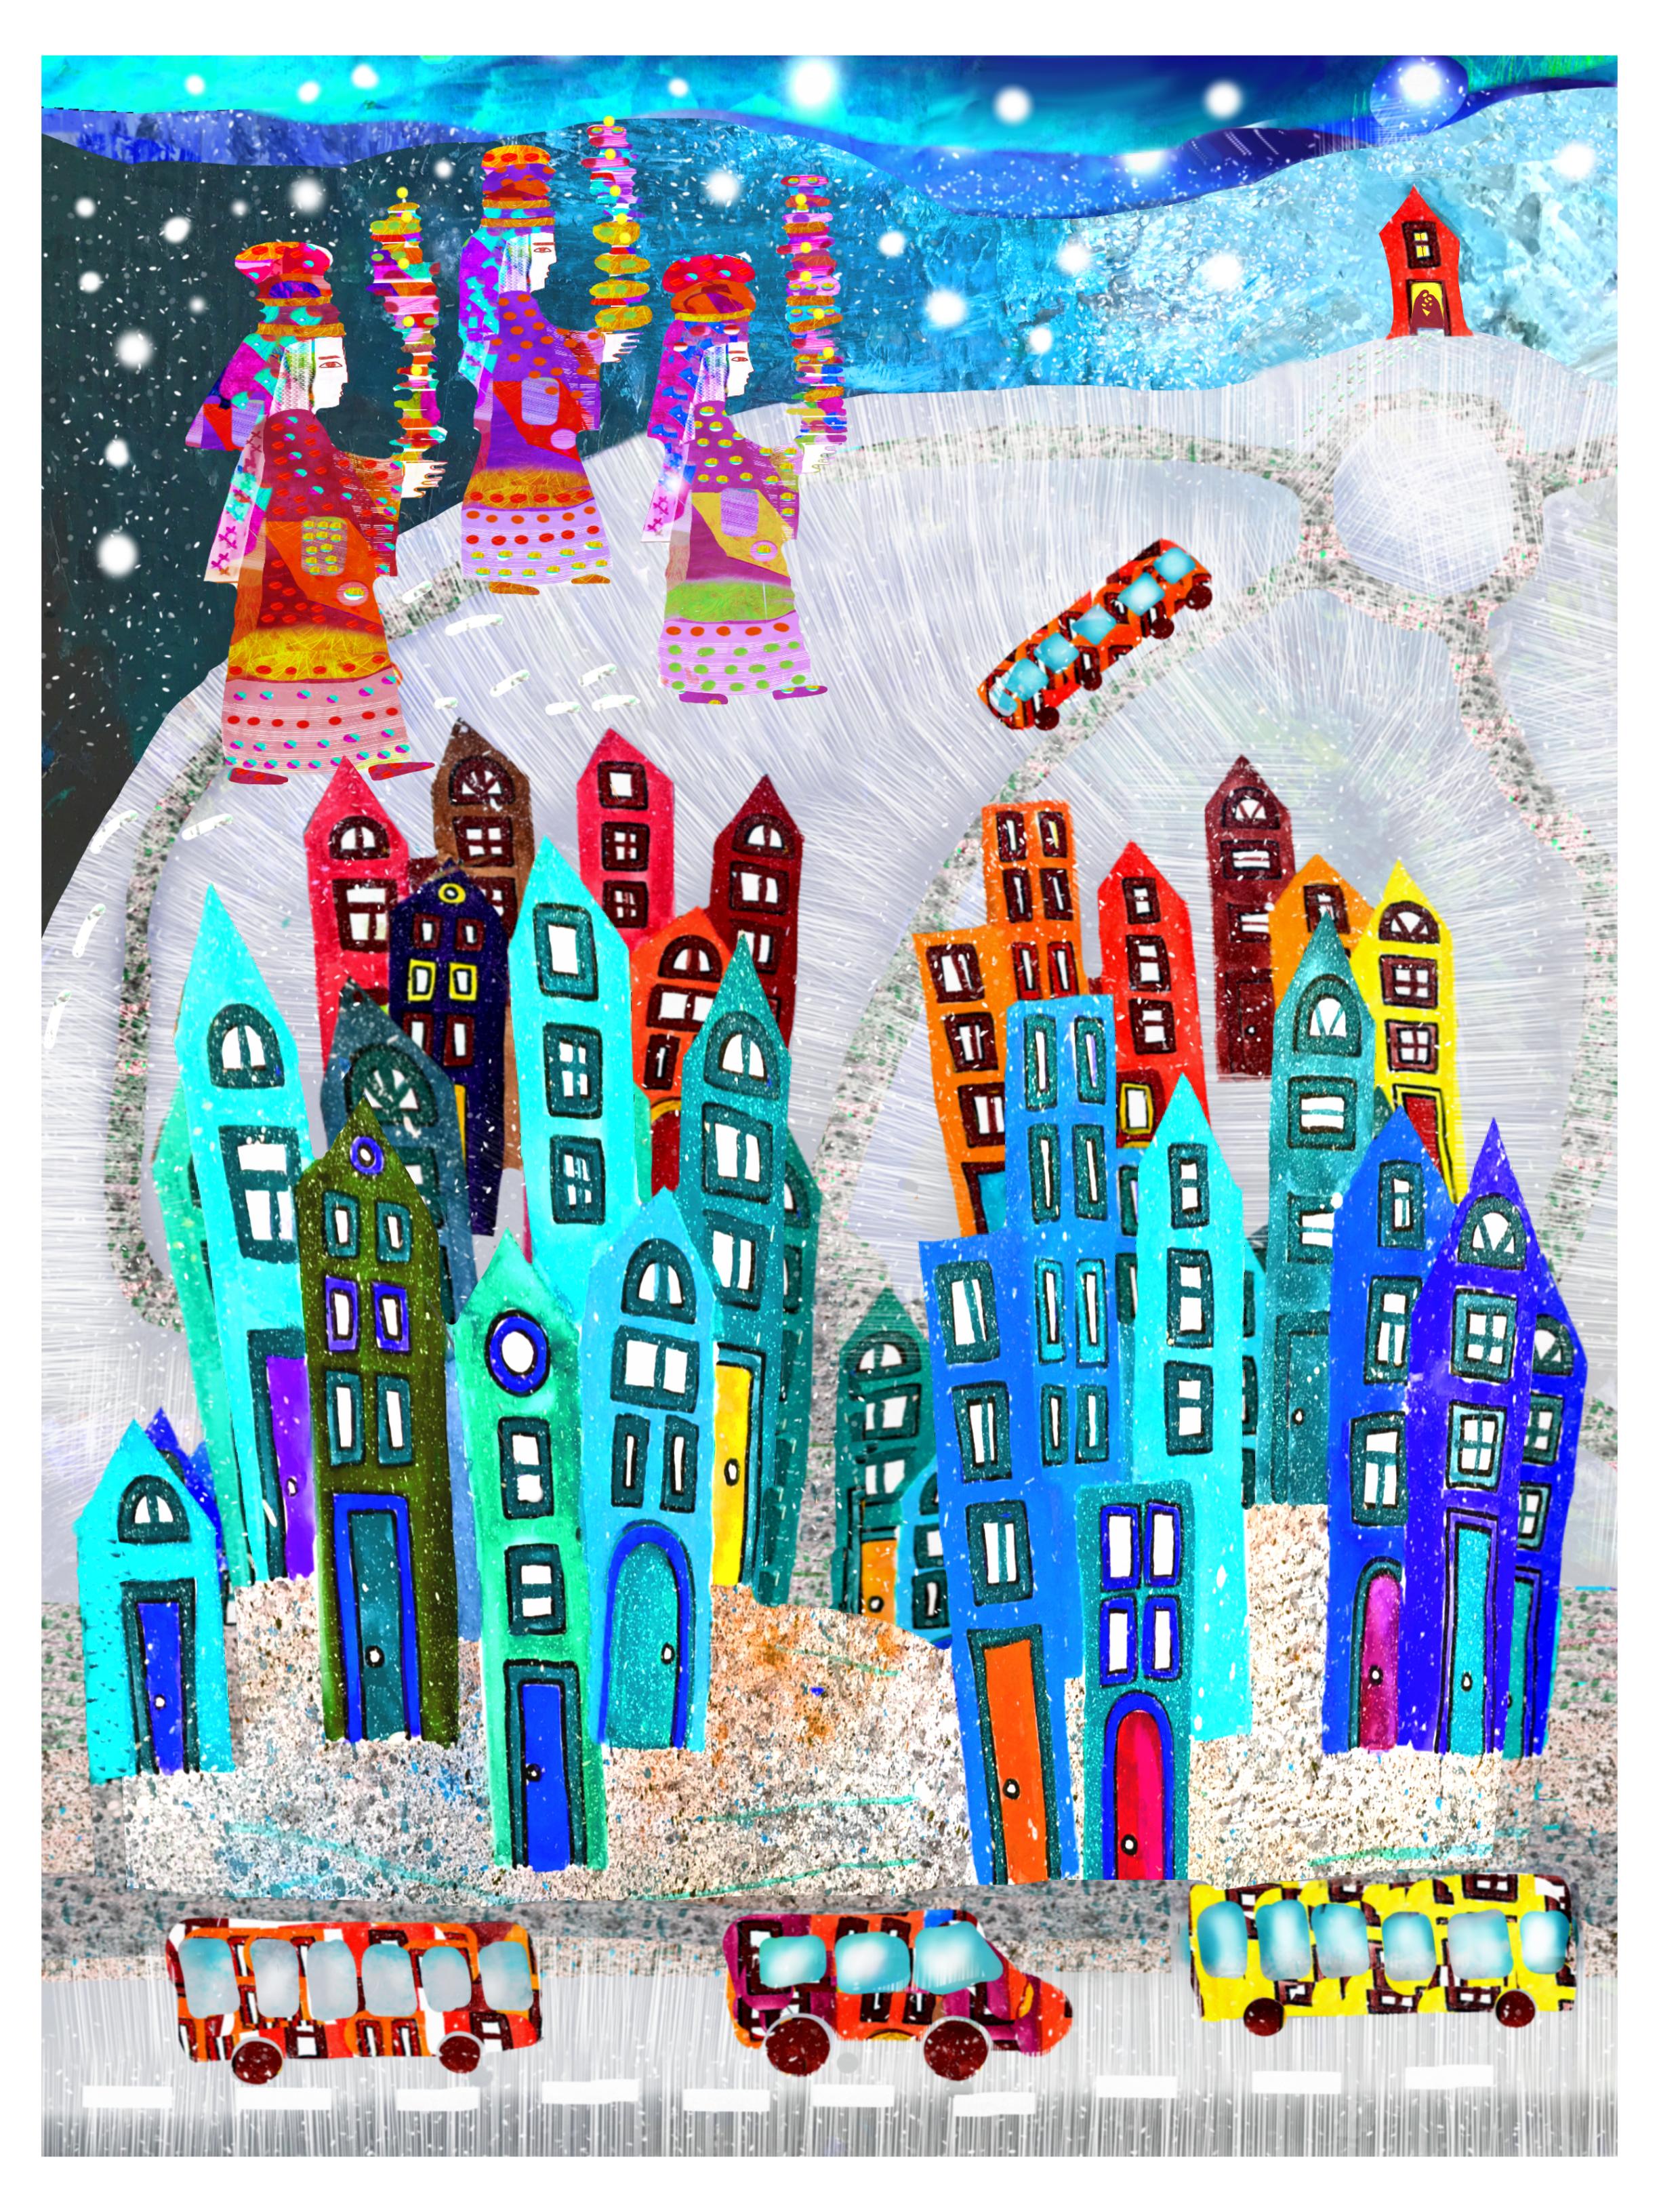 Three kings walking through the suburb in snow